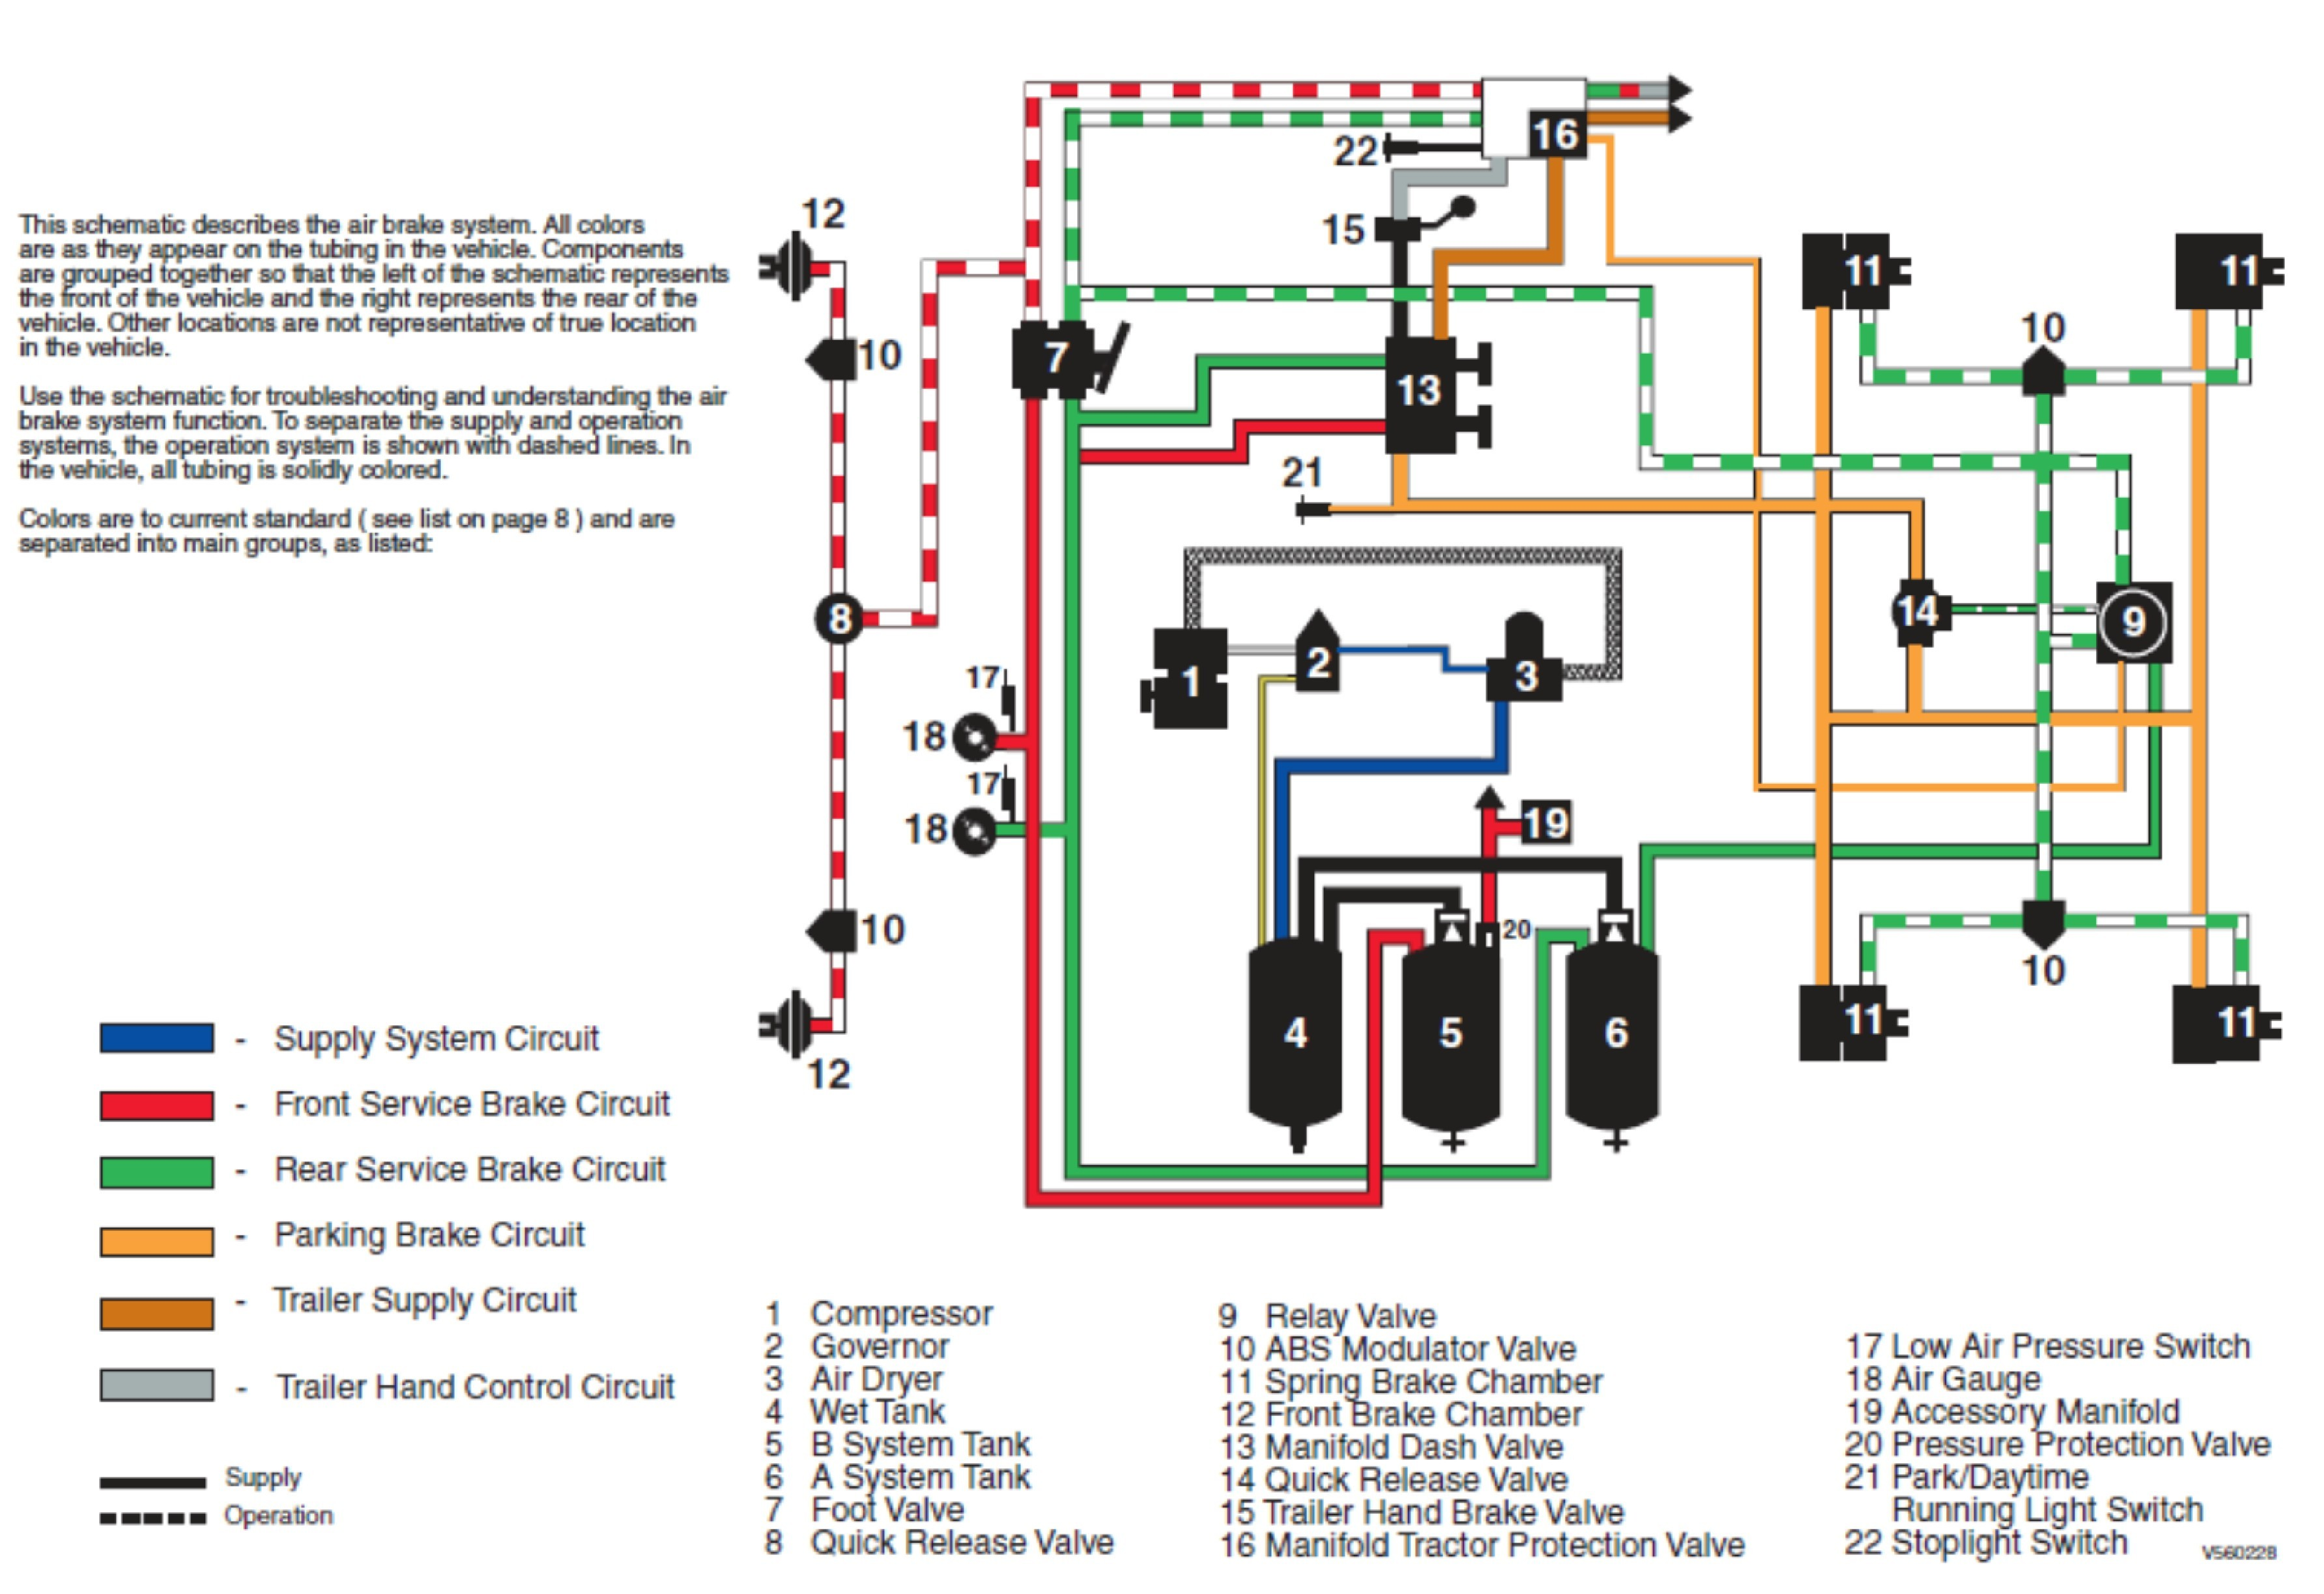 Automotive Brake System Diagram Hayes Brakesmart Maxbrake Controllers Of Automotive Brake System Diagram